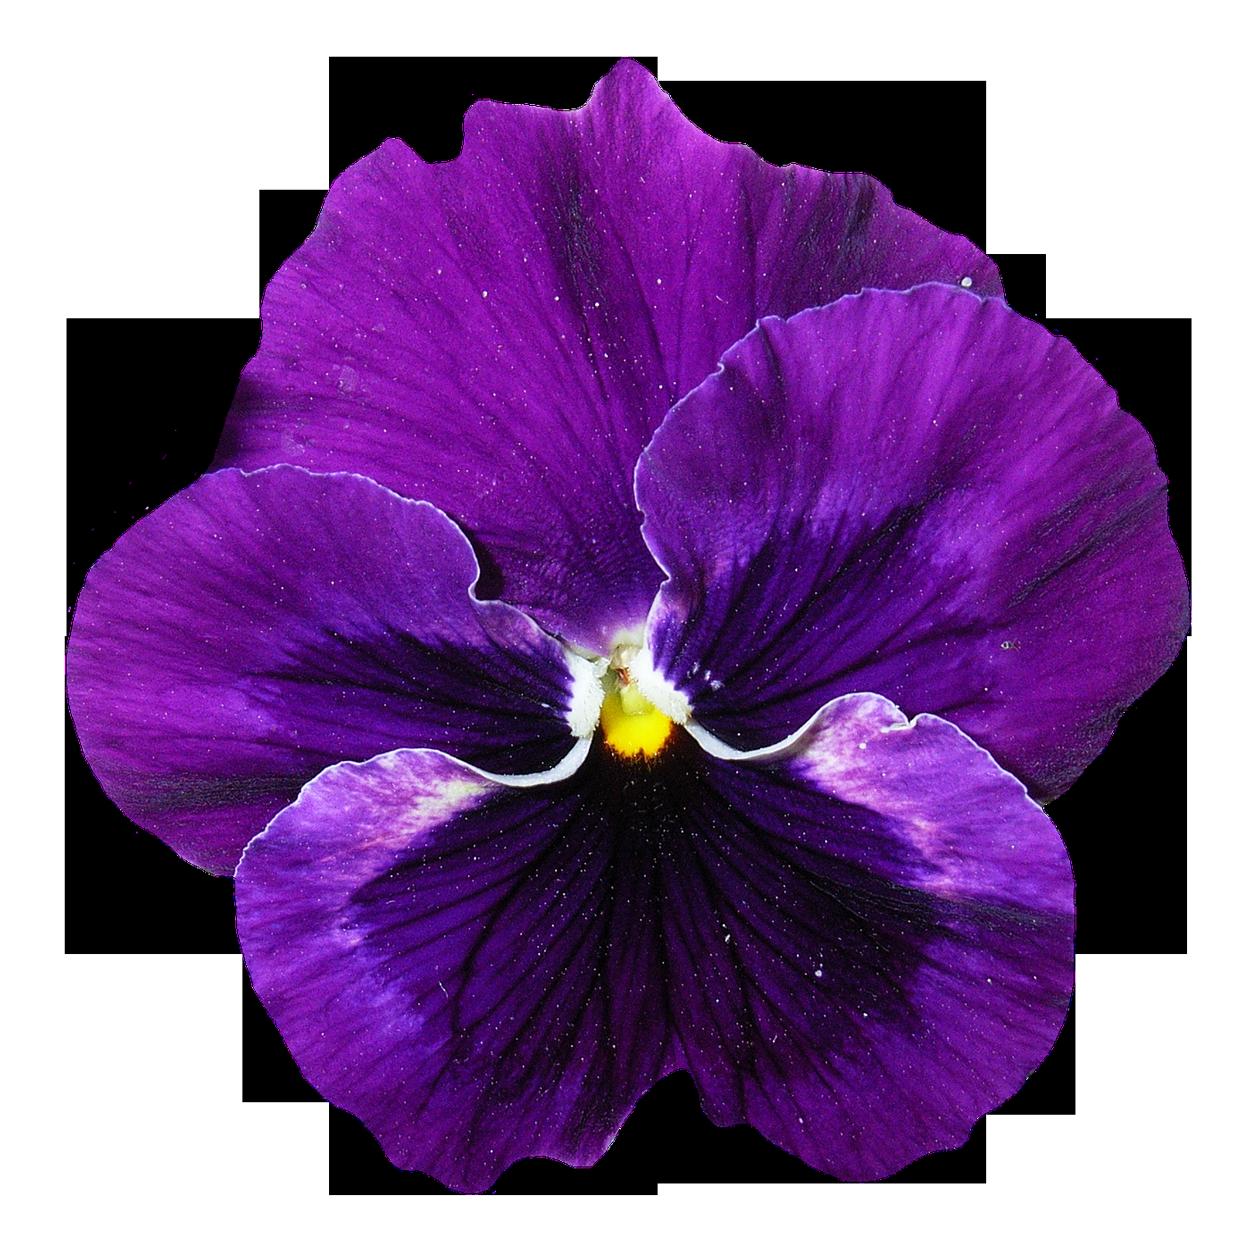 Pansy Flower Png Image Pansies Flowers Flower Background Wallpaper Pansies